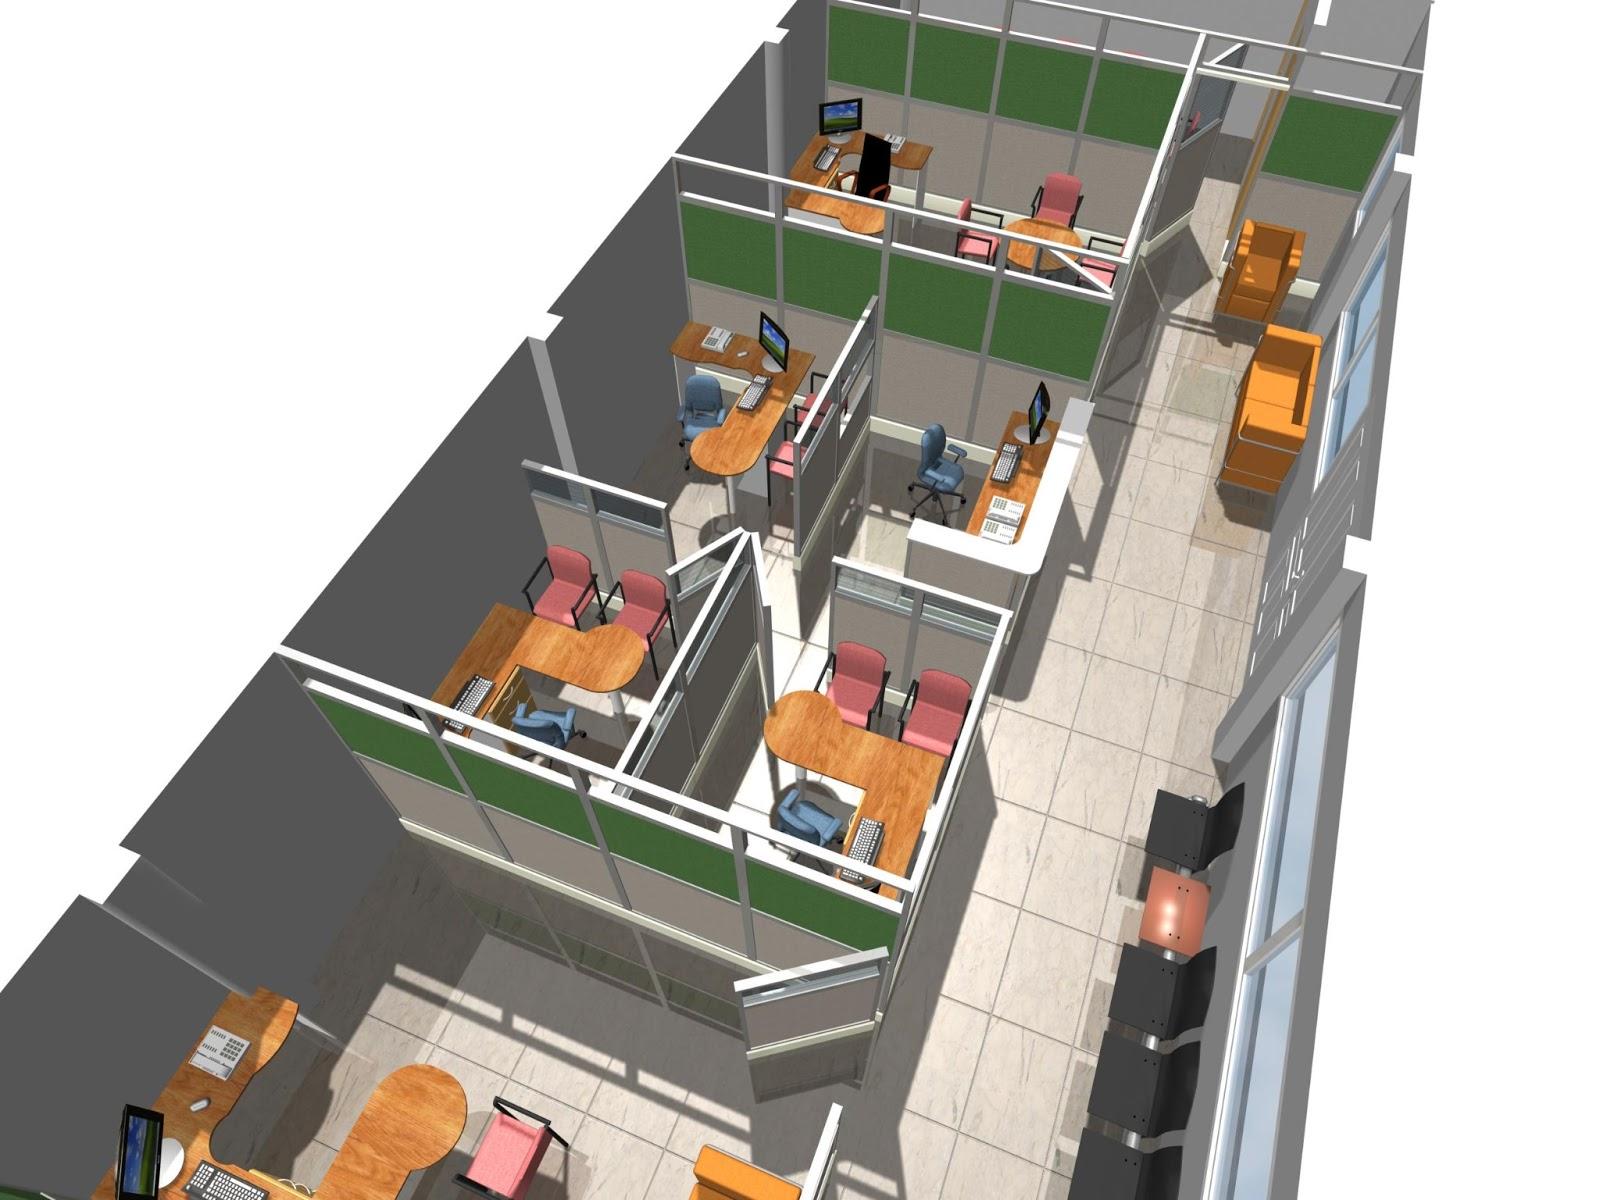 Dise os de oficinas dise o interiorismo construccion for Oficinas de diseno y arquitectura